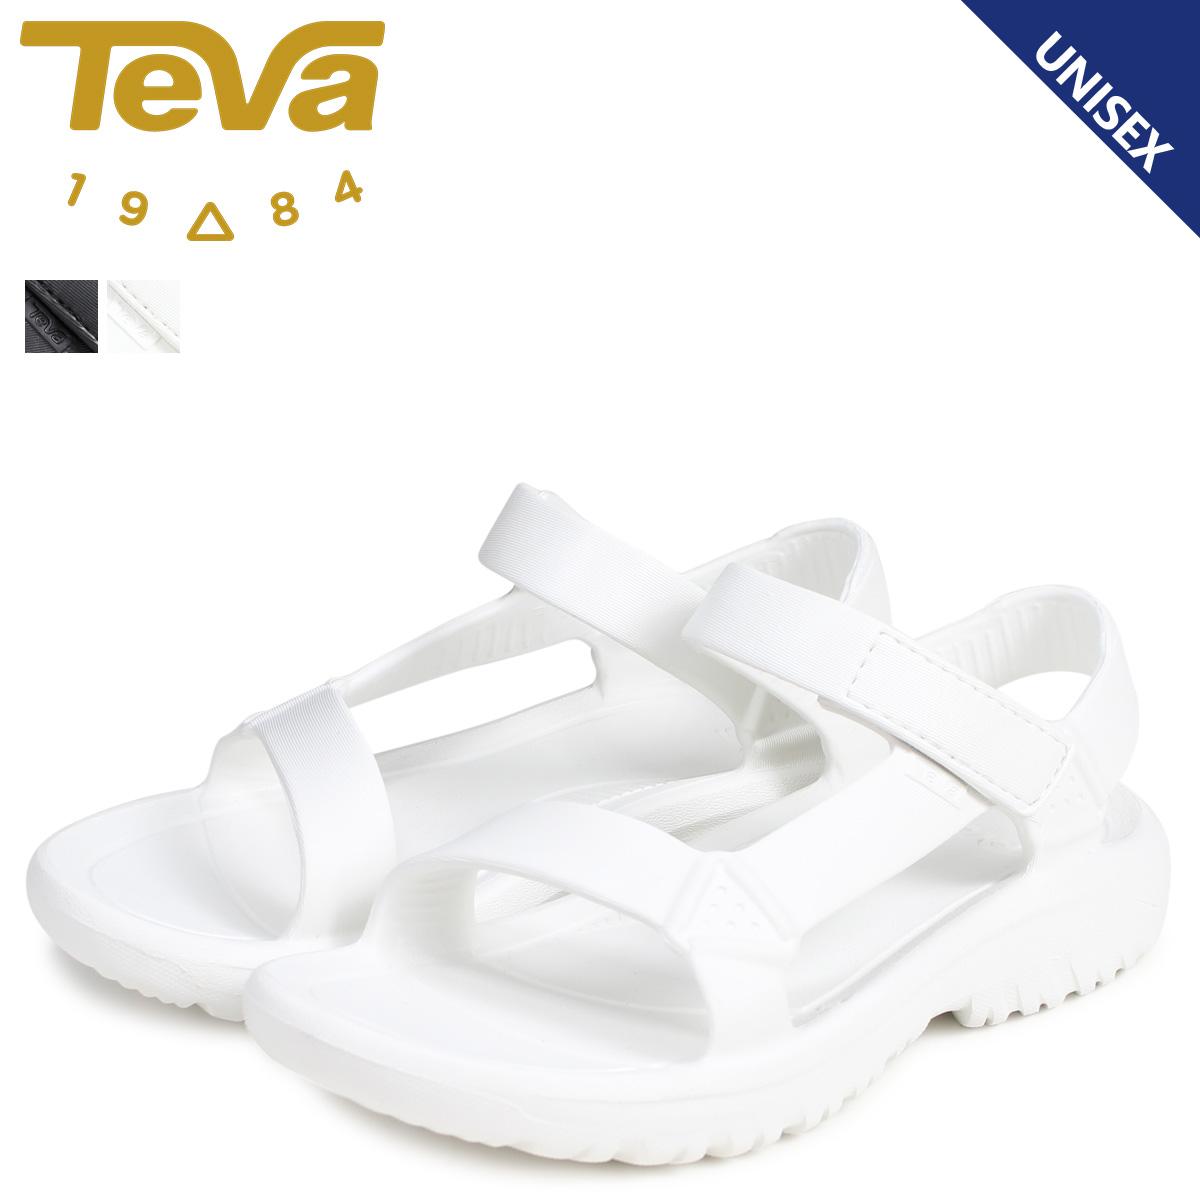 Teva テバ サンダル ハリケーン レディース メンズ HURRICANE DRIFT ブラック ホワイト 黒 白 1102390